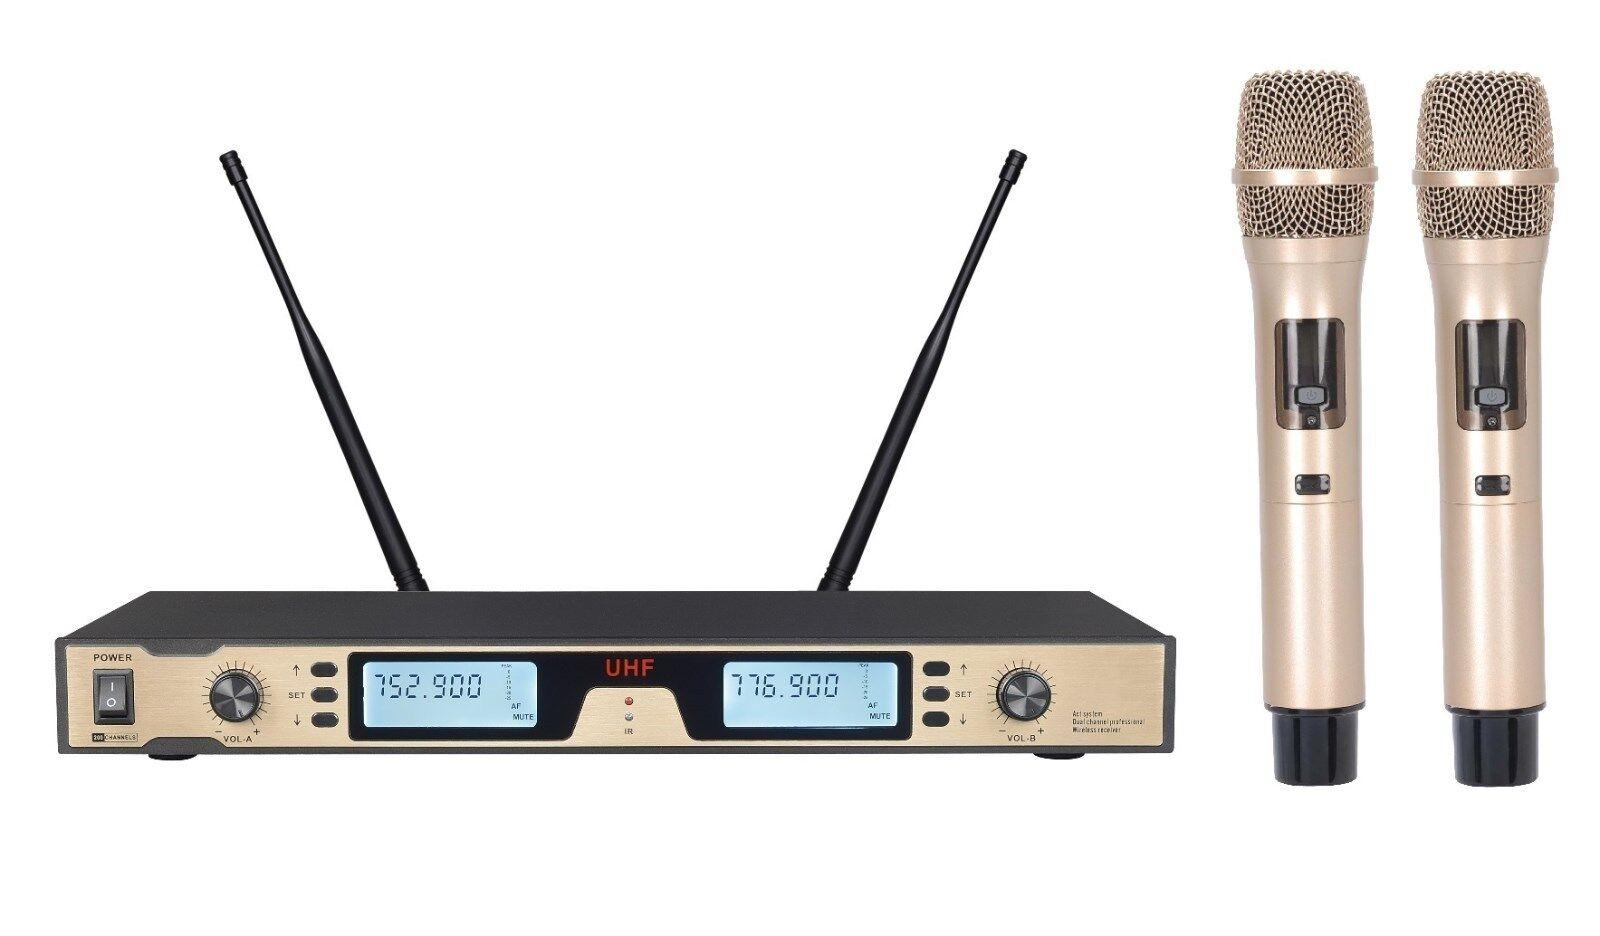 Pro radio inalámbrica UHF UHF UHF Doble Micrófono Mic Doble Mano Dorada de oro 9cc081